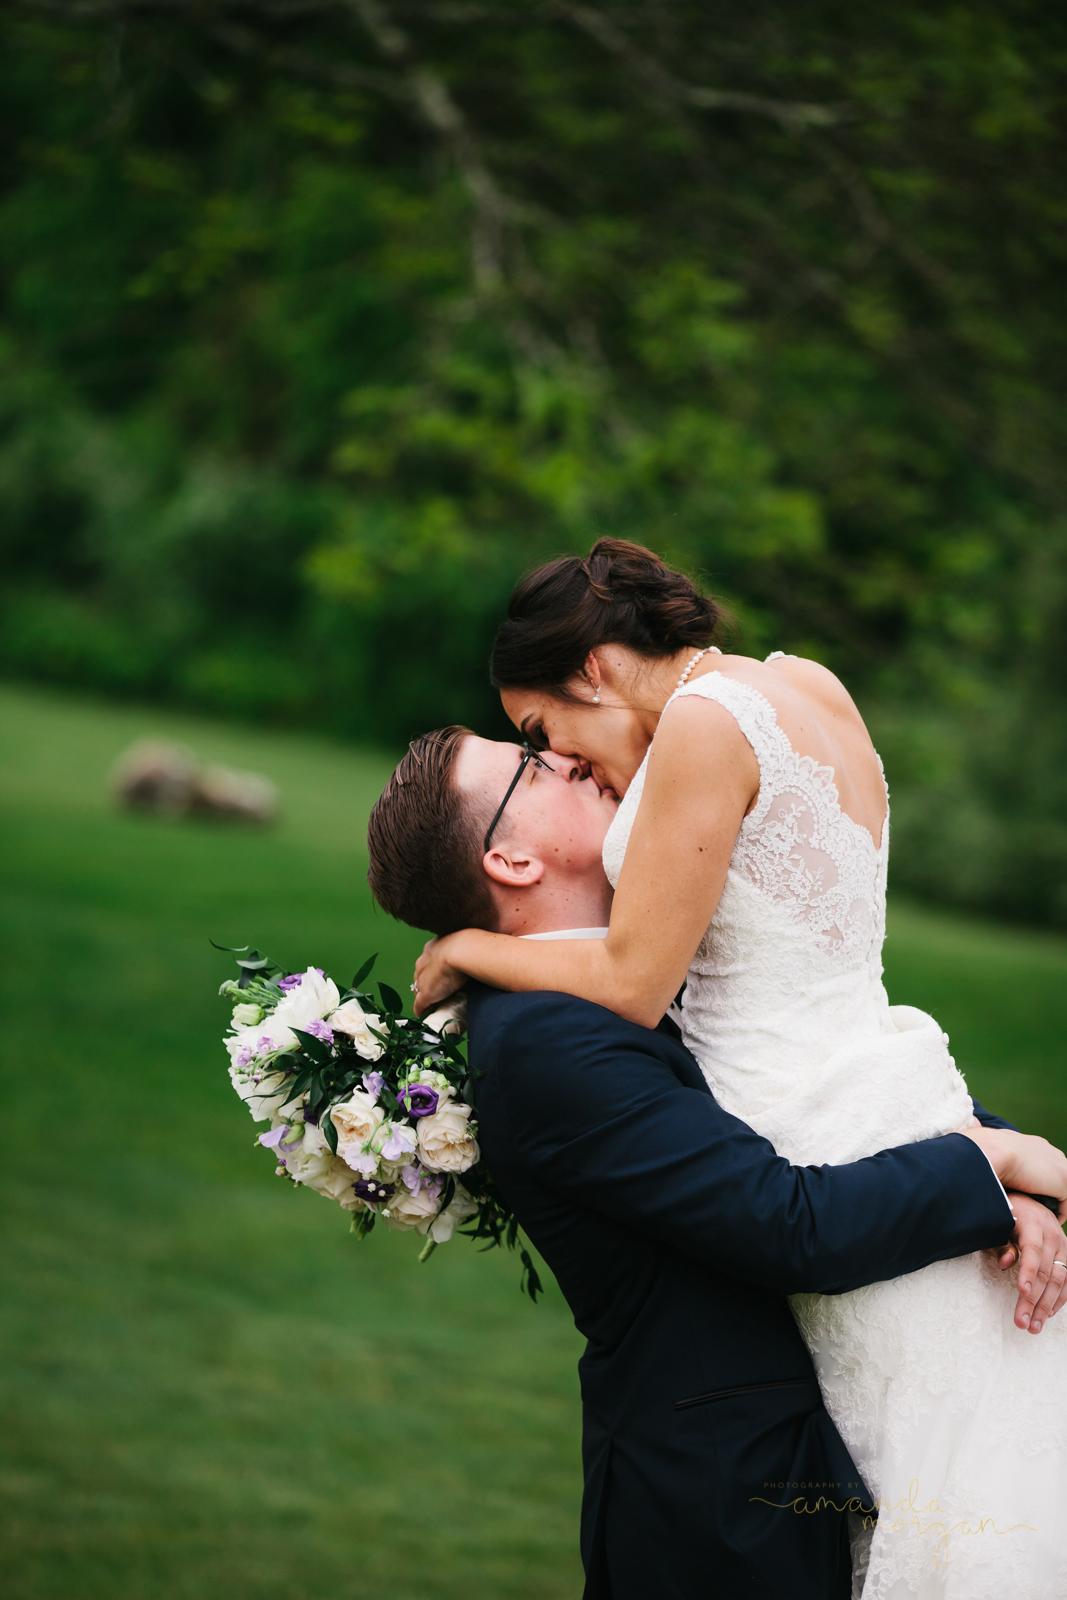 Publick-House-Wedding-Amanda-Morgan-35.jpg